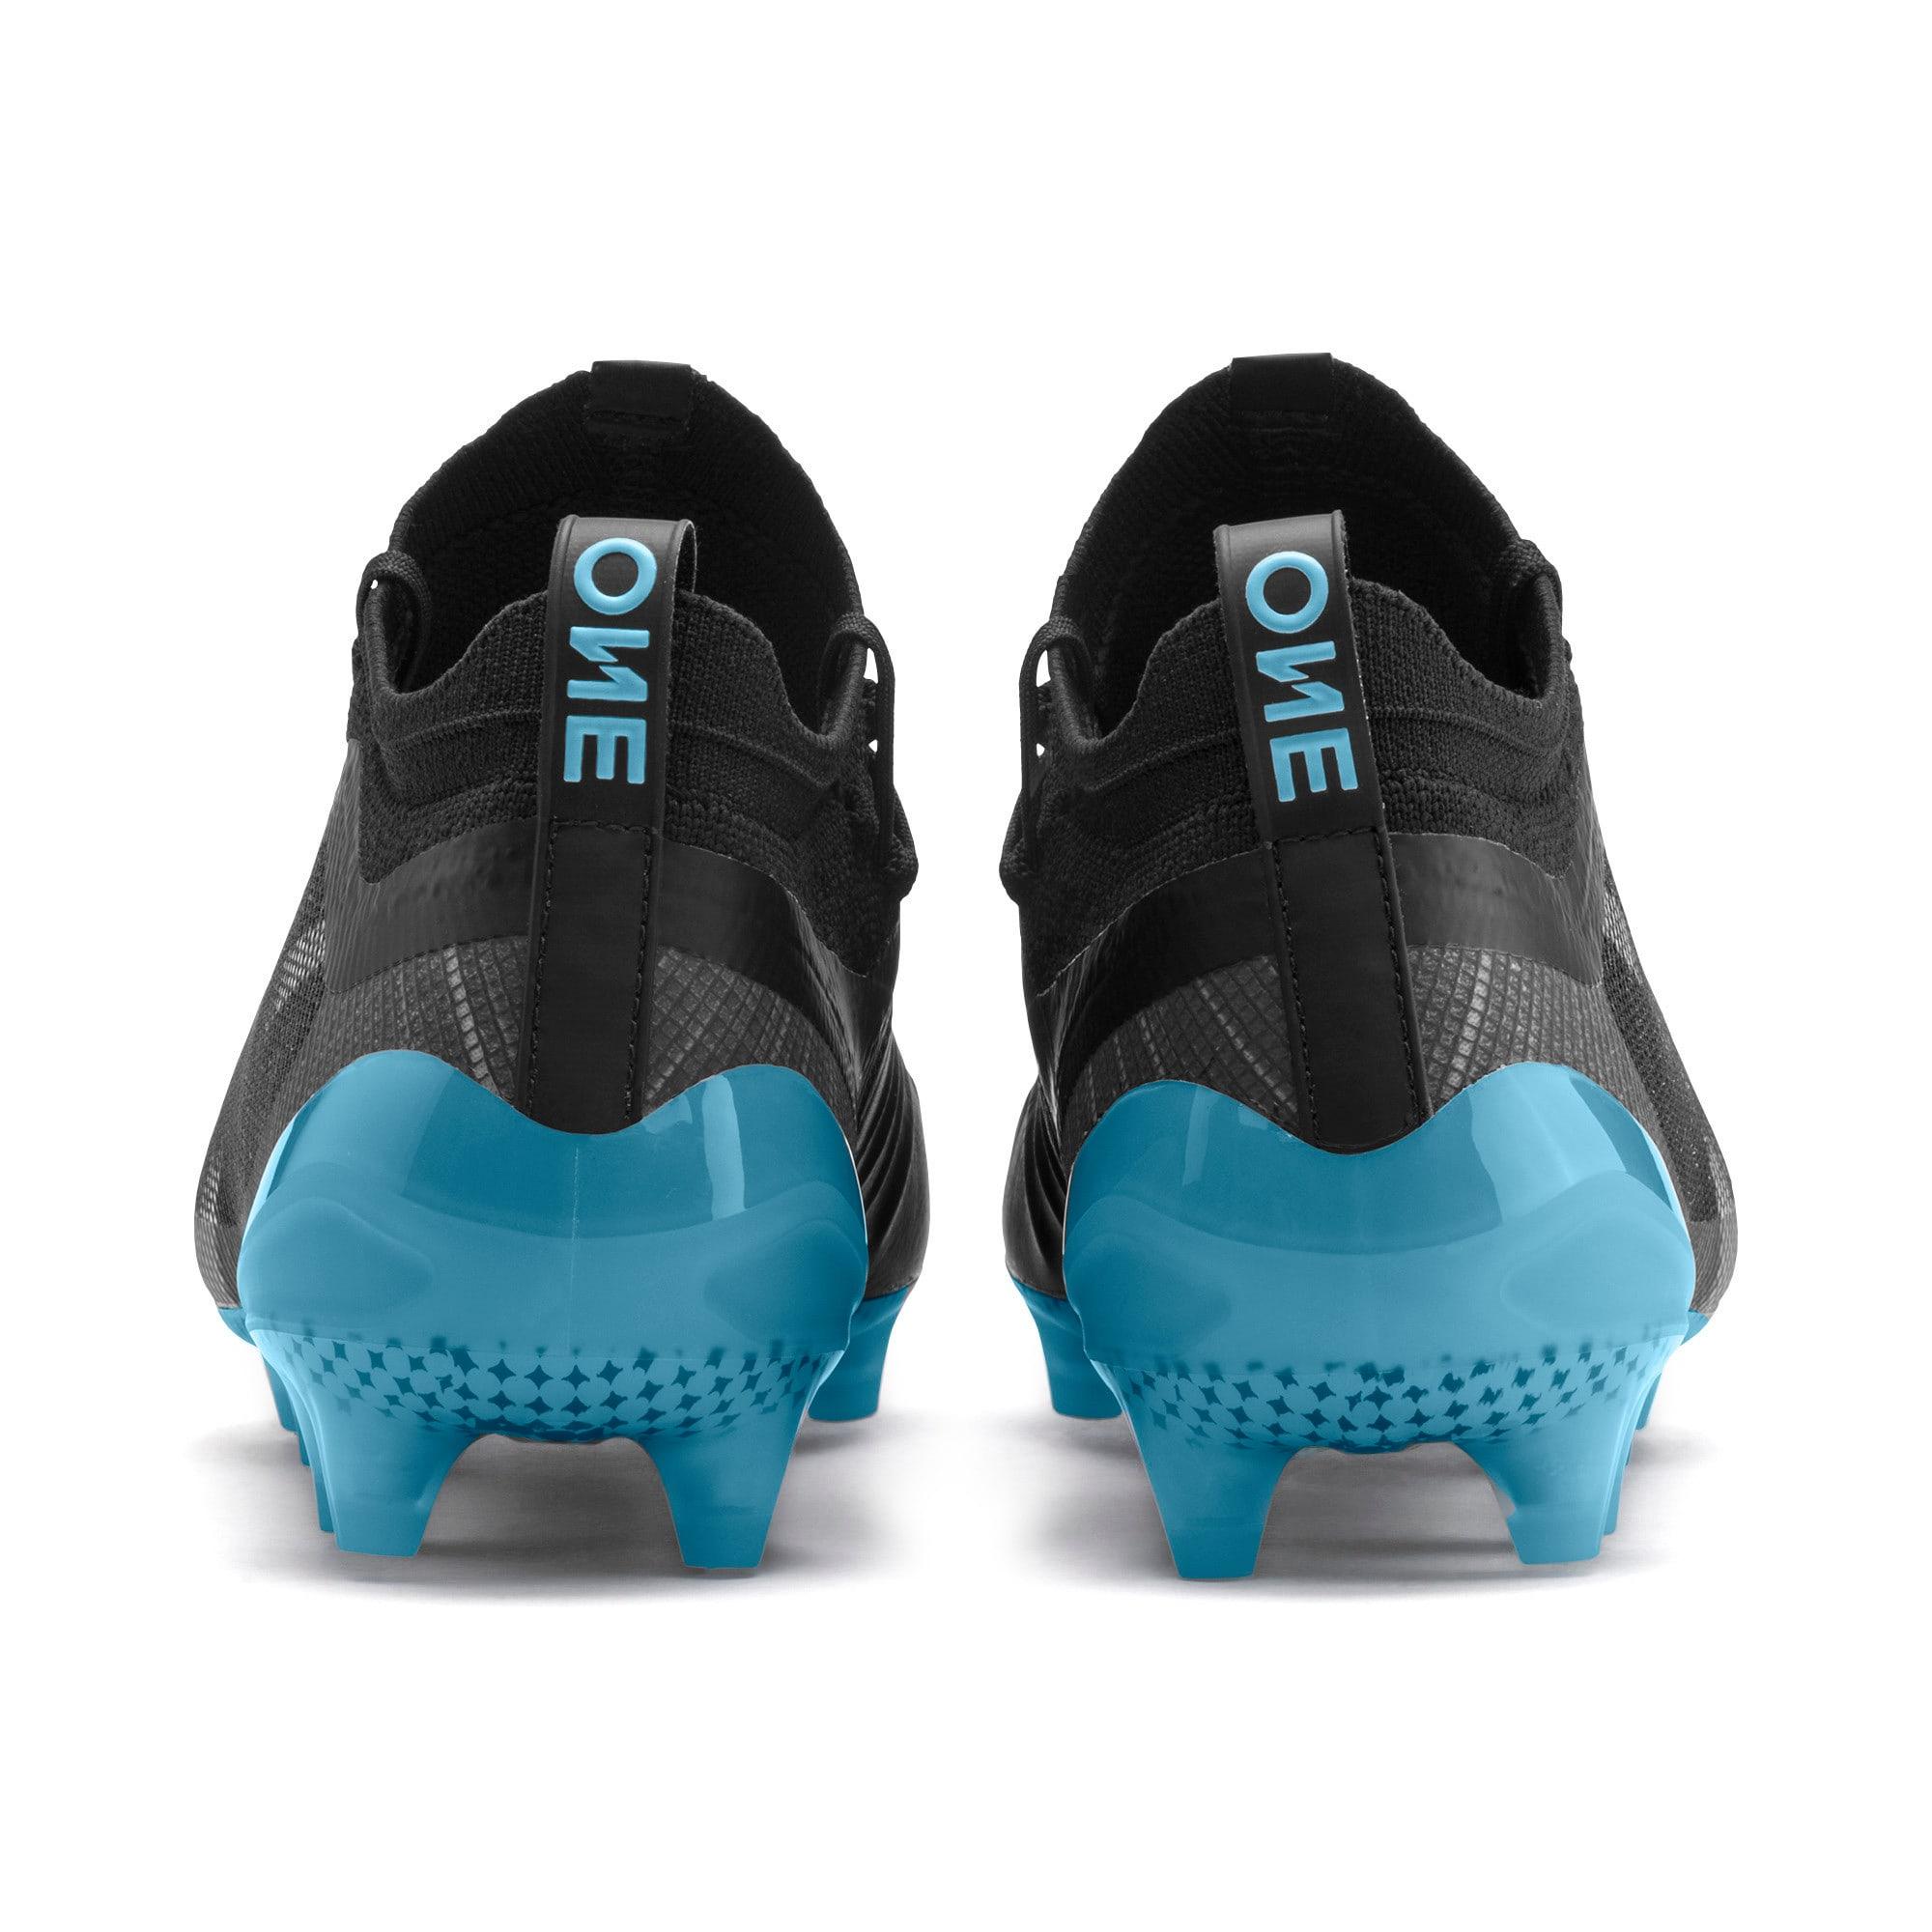 Imagen en miniatura 4 de Botas de fútbol de hombre PUMA ONE 5.1 City, Black-Sky Blue-Silver, mediana